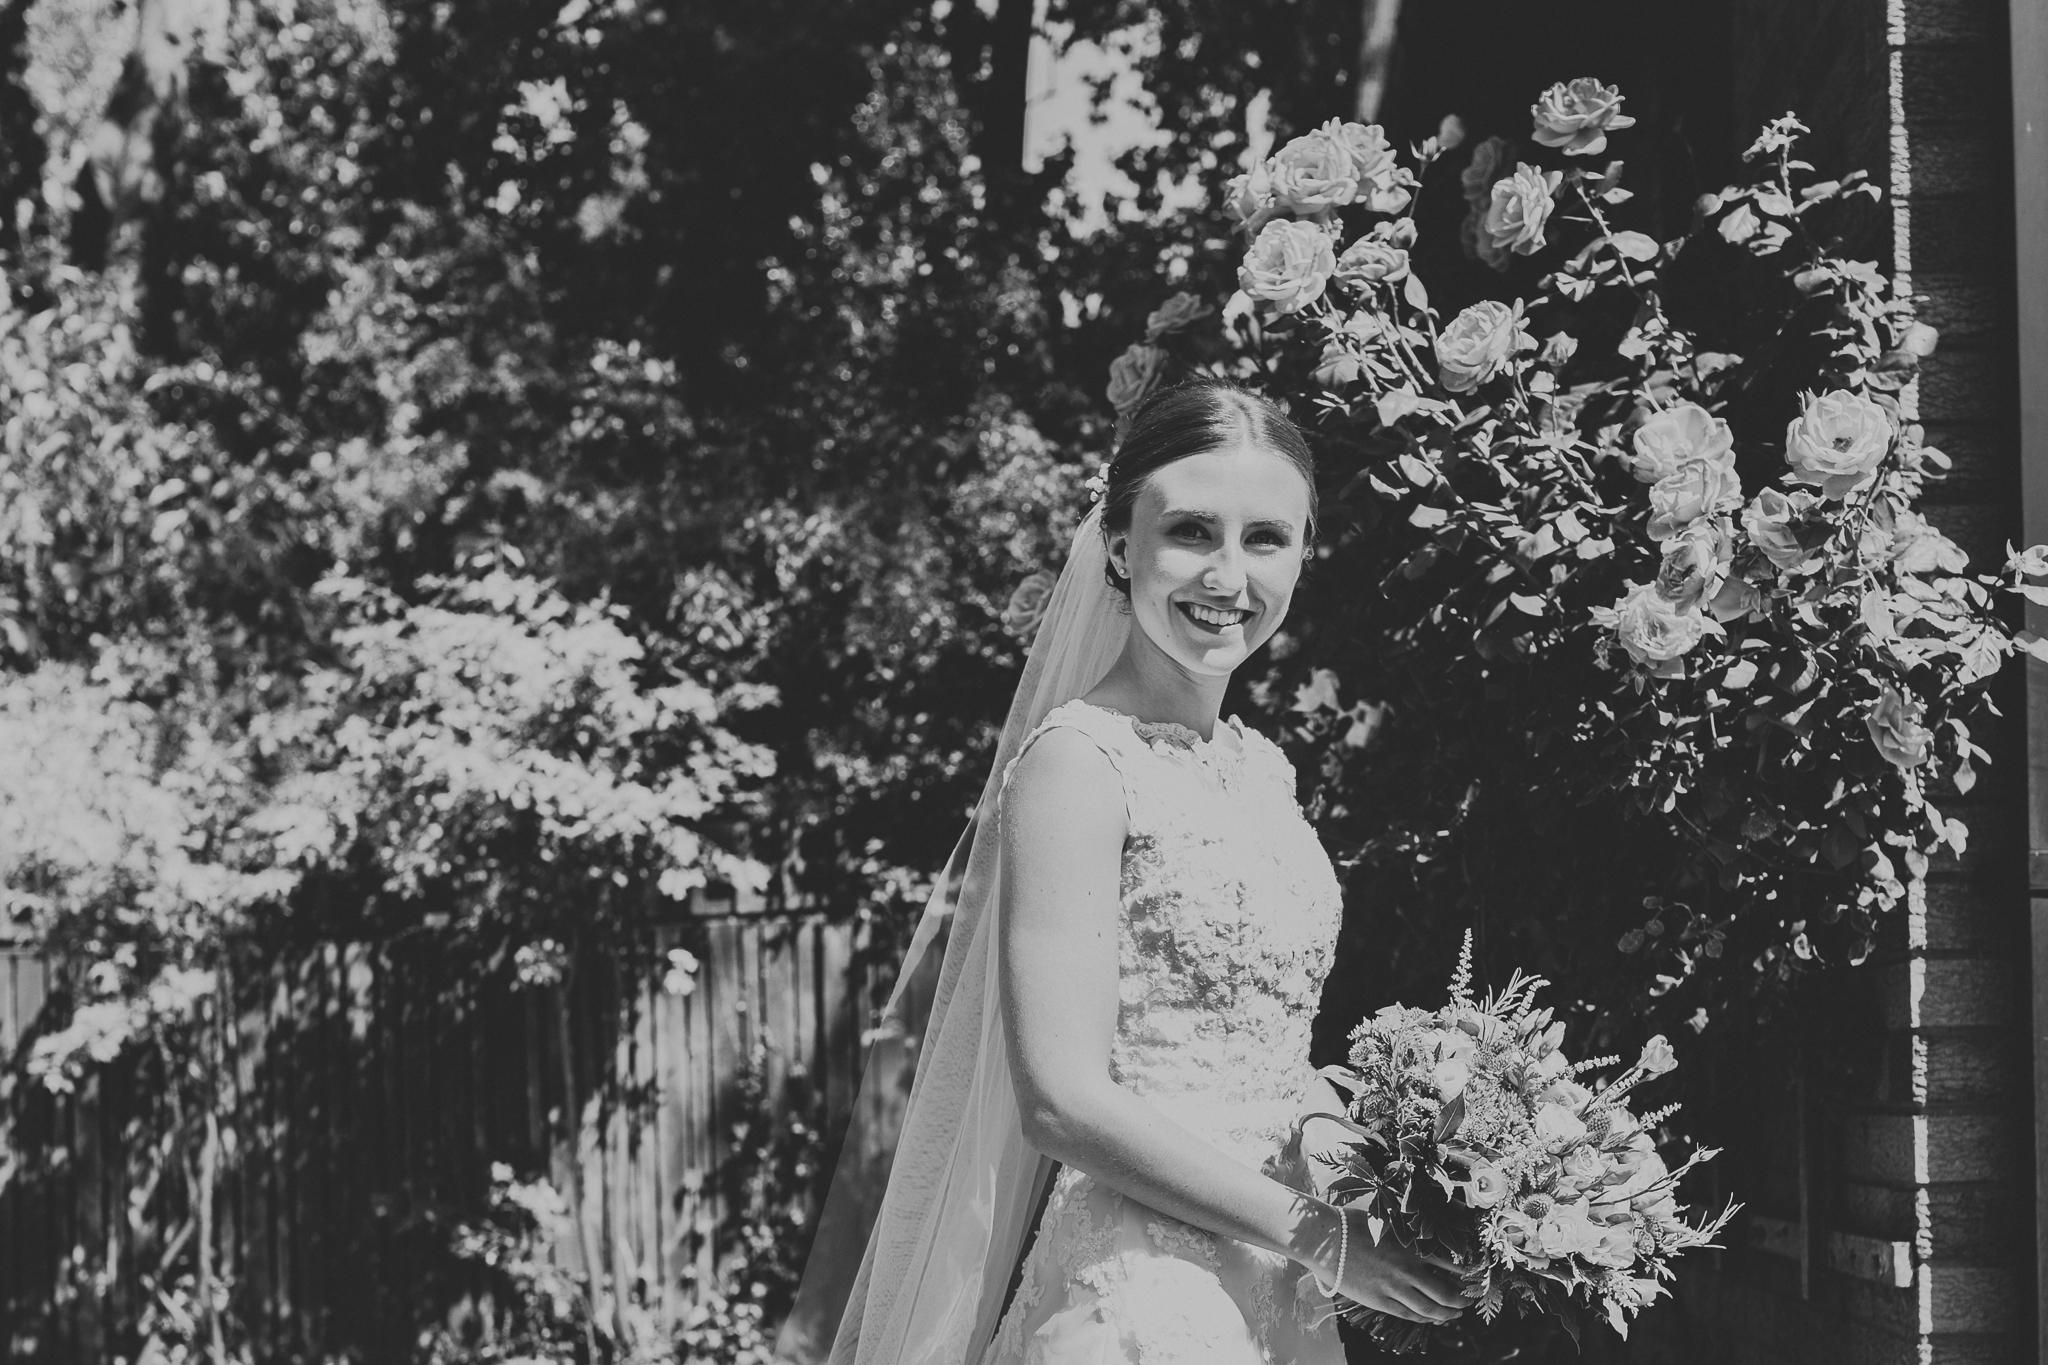 Jess and Ben - Liverpool wedding - Bridal portrait